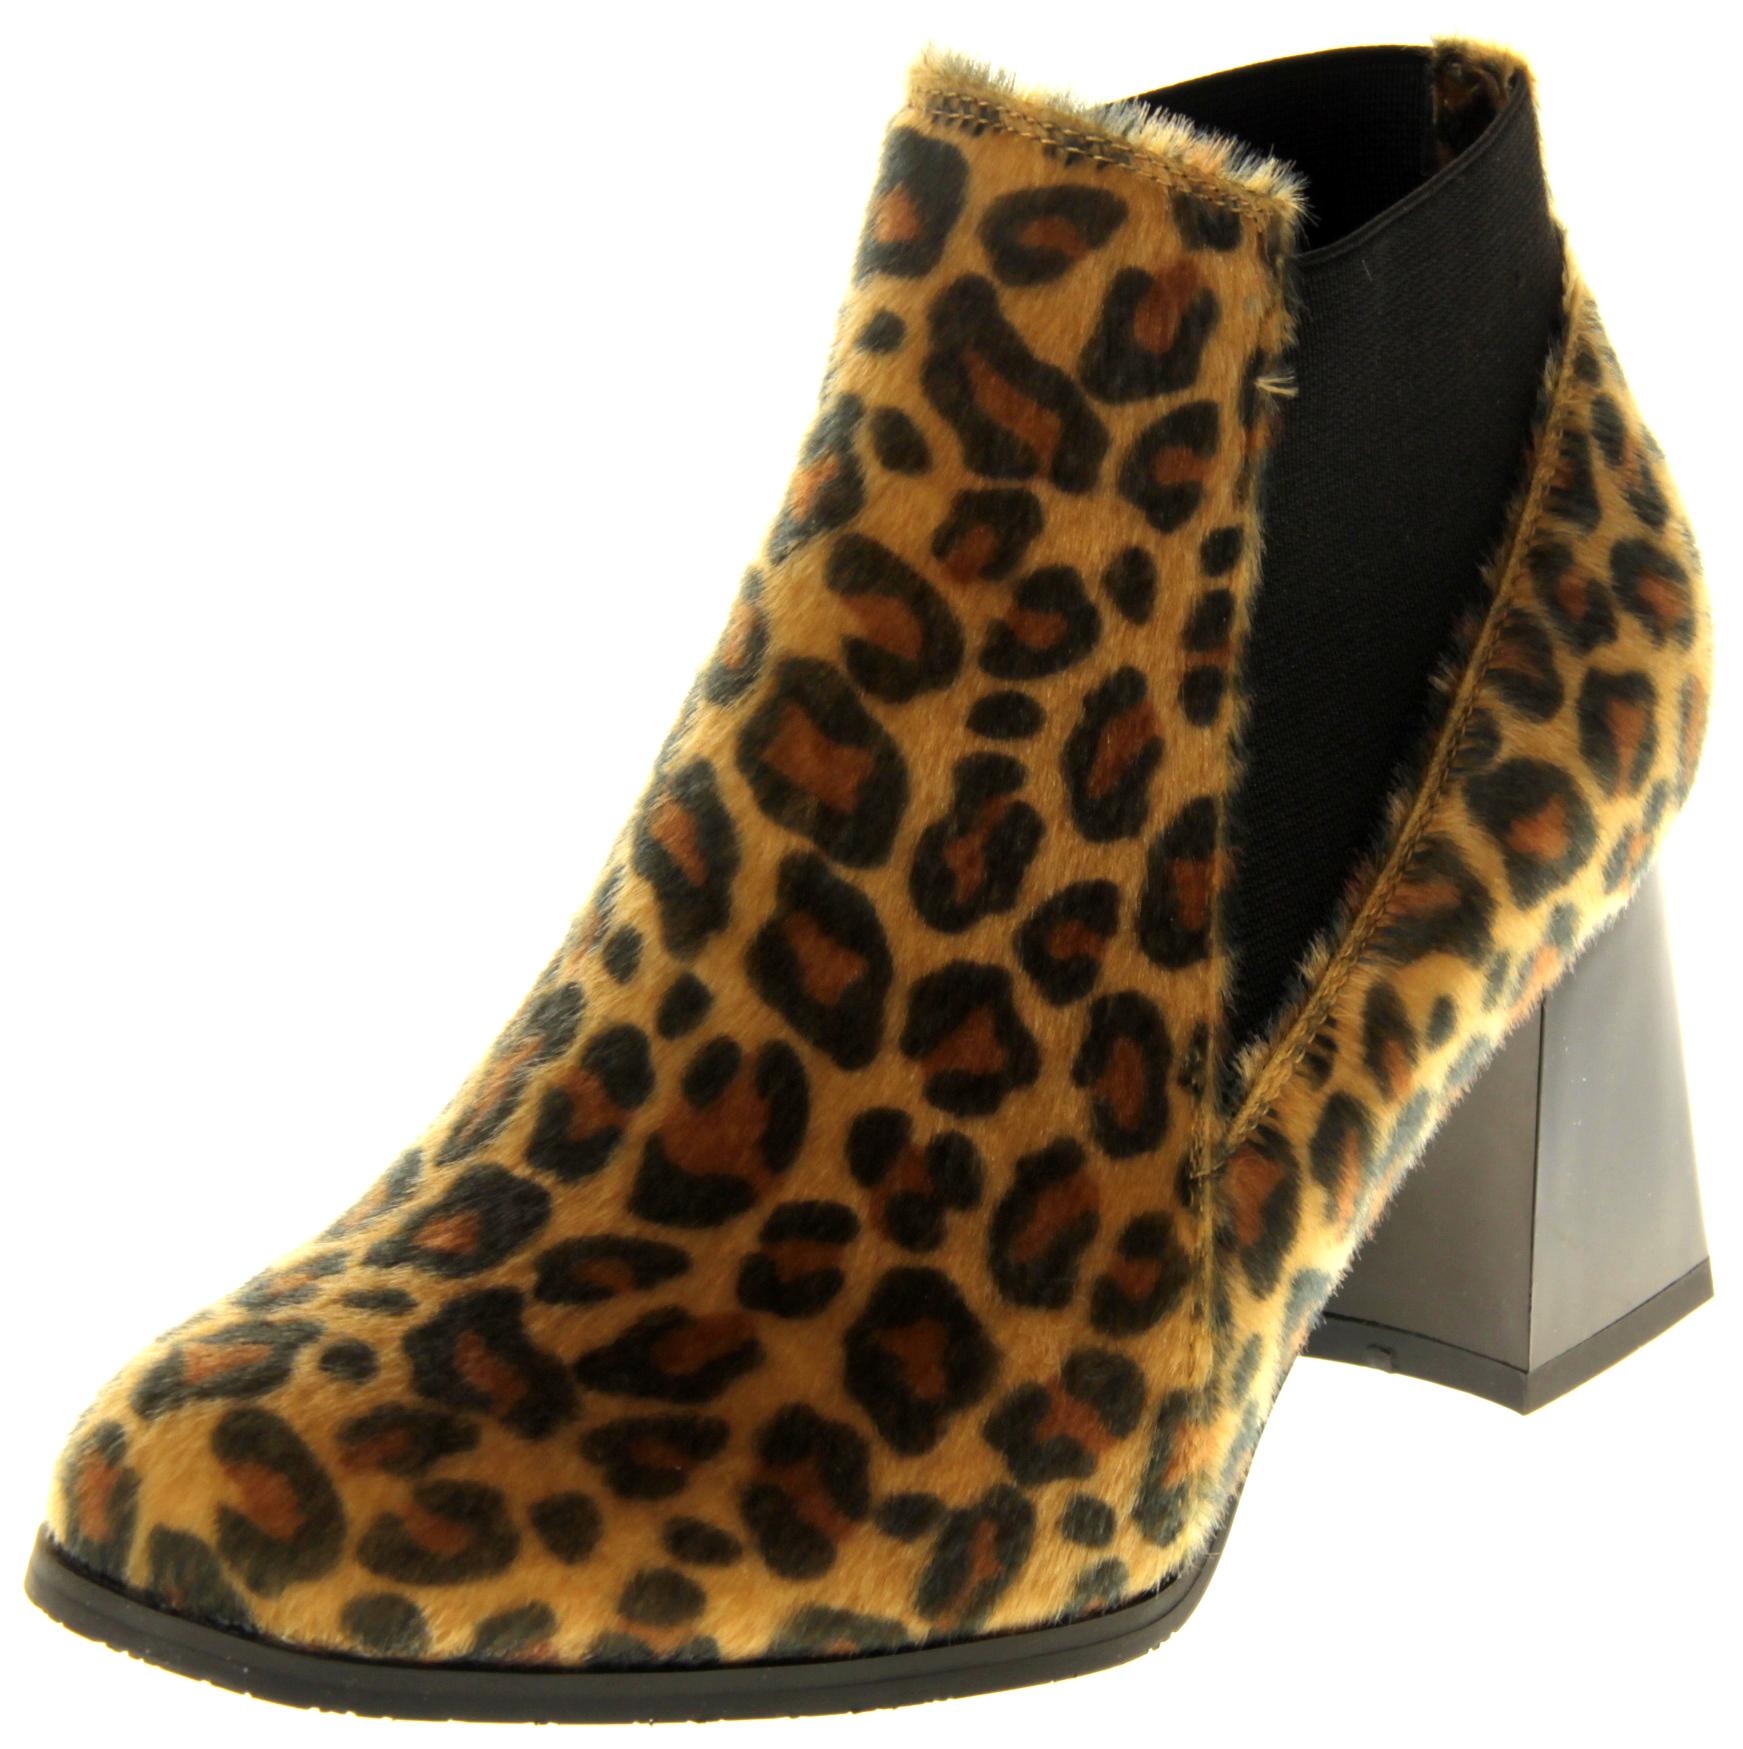 ffe244dff5 Womens Ladies Betsy Leopard Print Block Heeled Ankle Boots | Womens, Mens,  Kids Shoes | Heels, Trainers & Boots | Footwear Studio